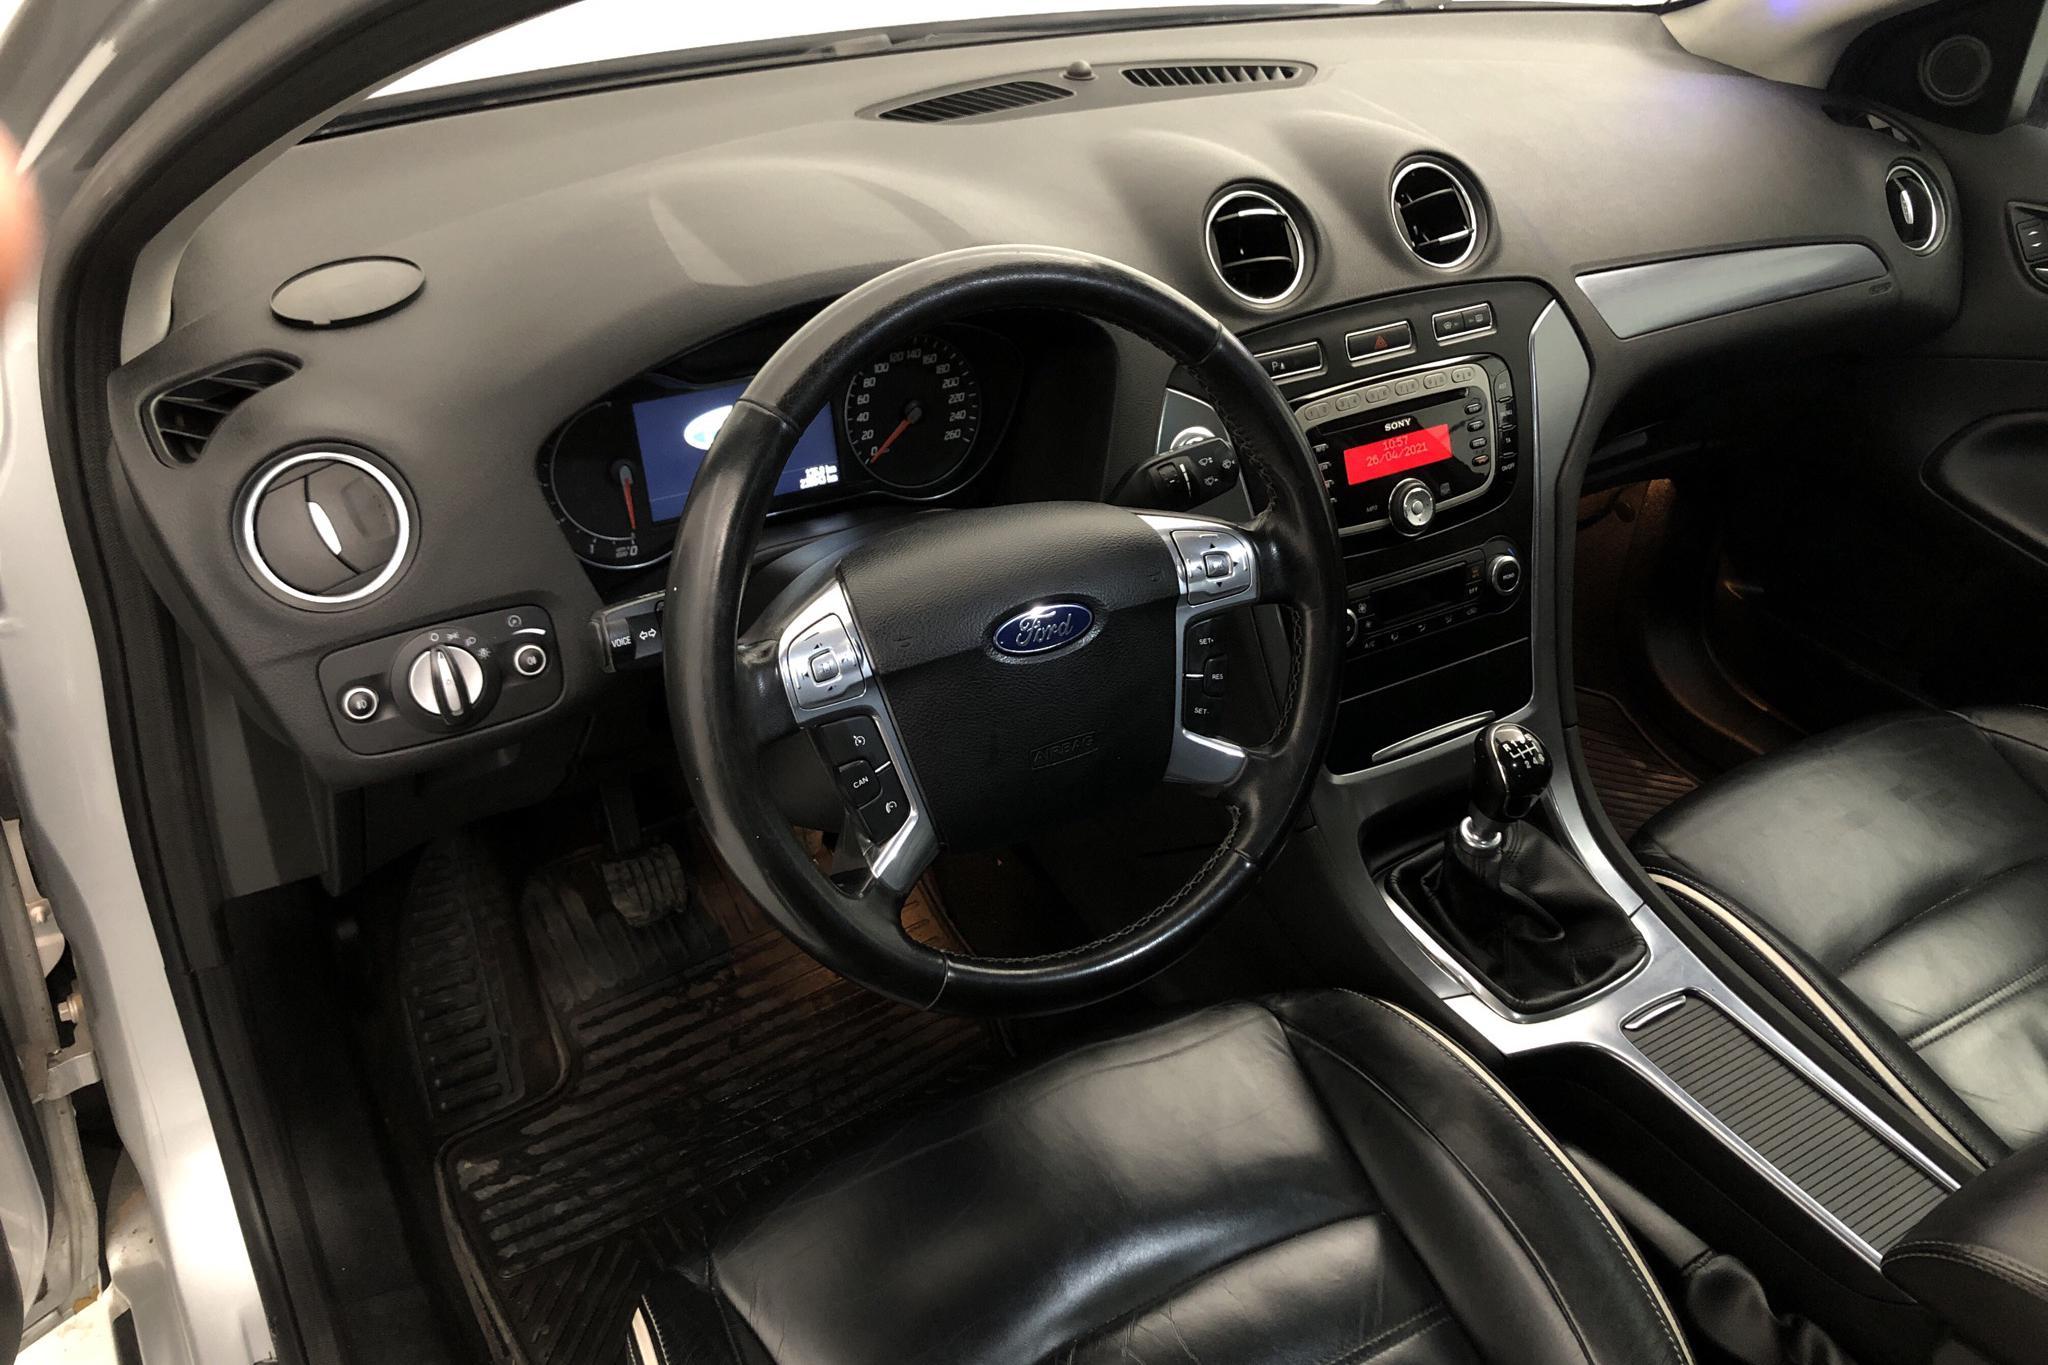 Ford Mondeo 2.0 Duratorq TDCi Kombi (163hk) - 236 840 km - Manual - gray - 2011